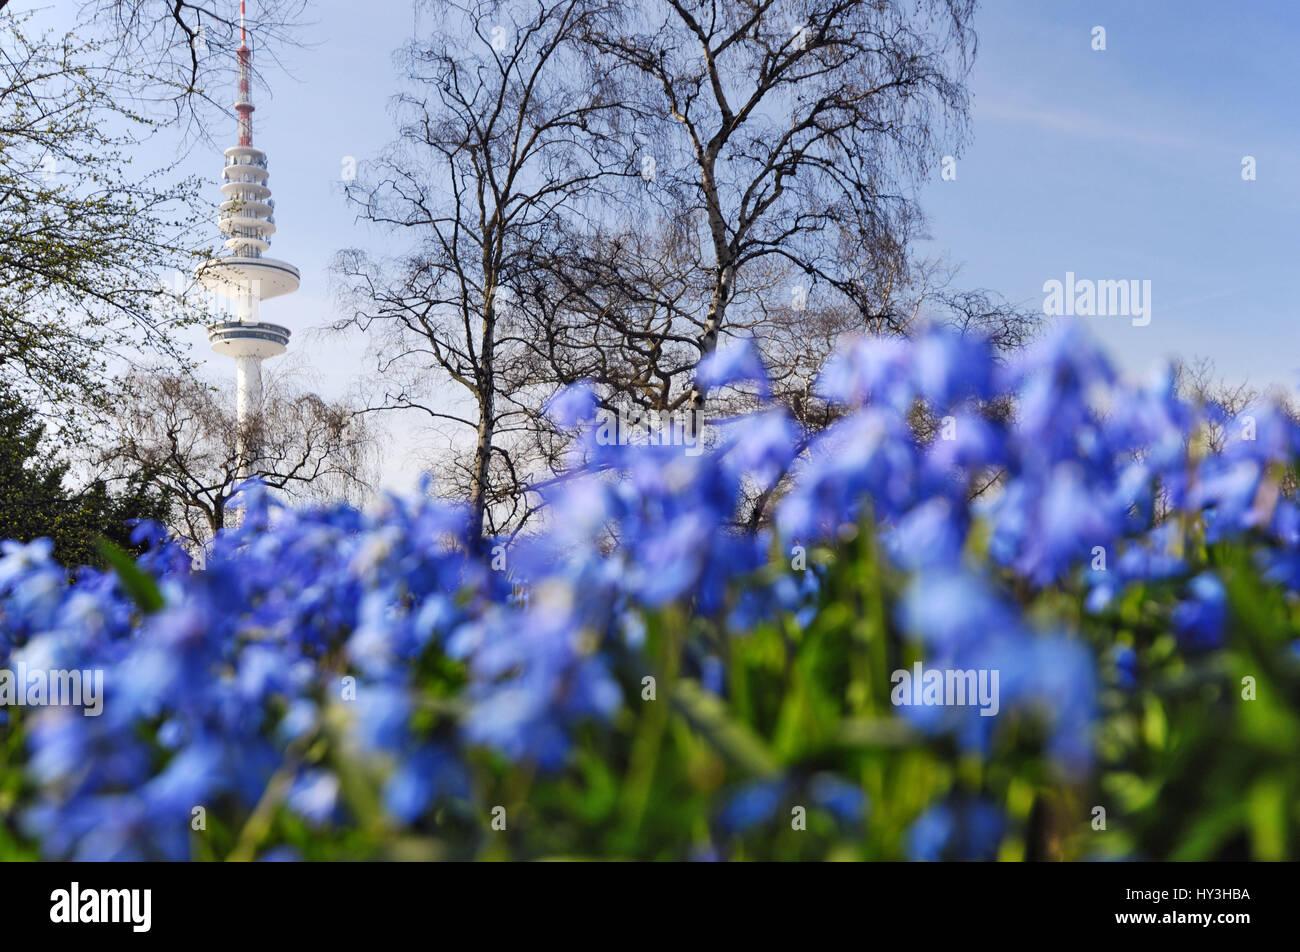 Frühlingsblumen Stock Photos & Frühlingsblumen Stock Images - Alamy